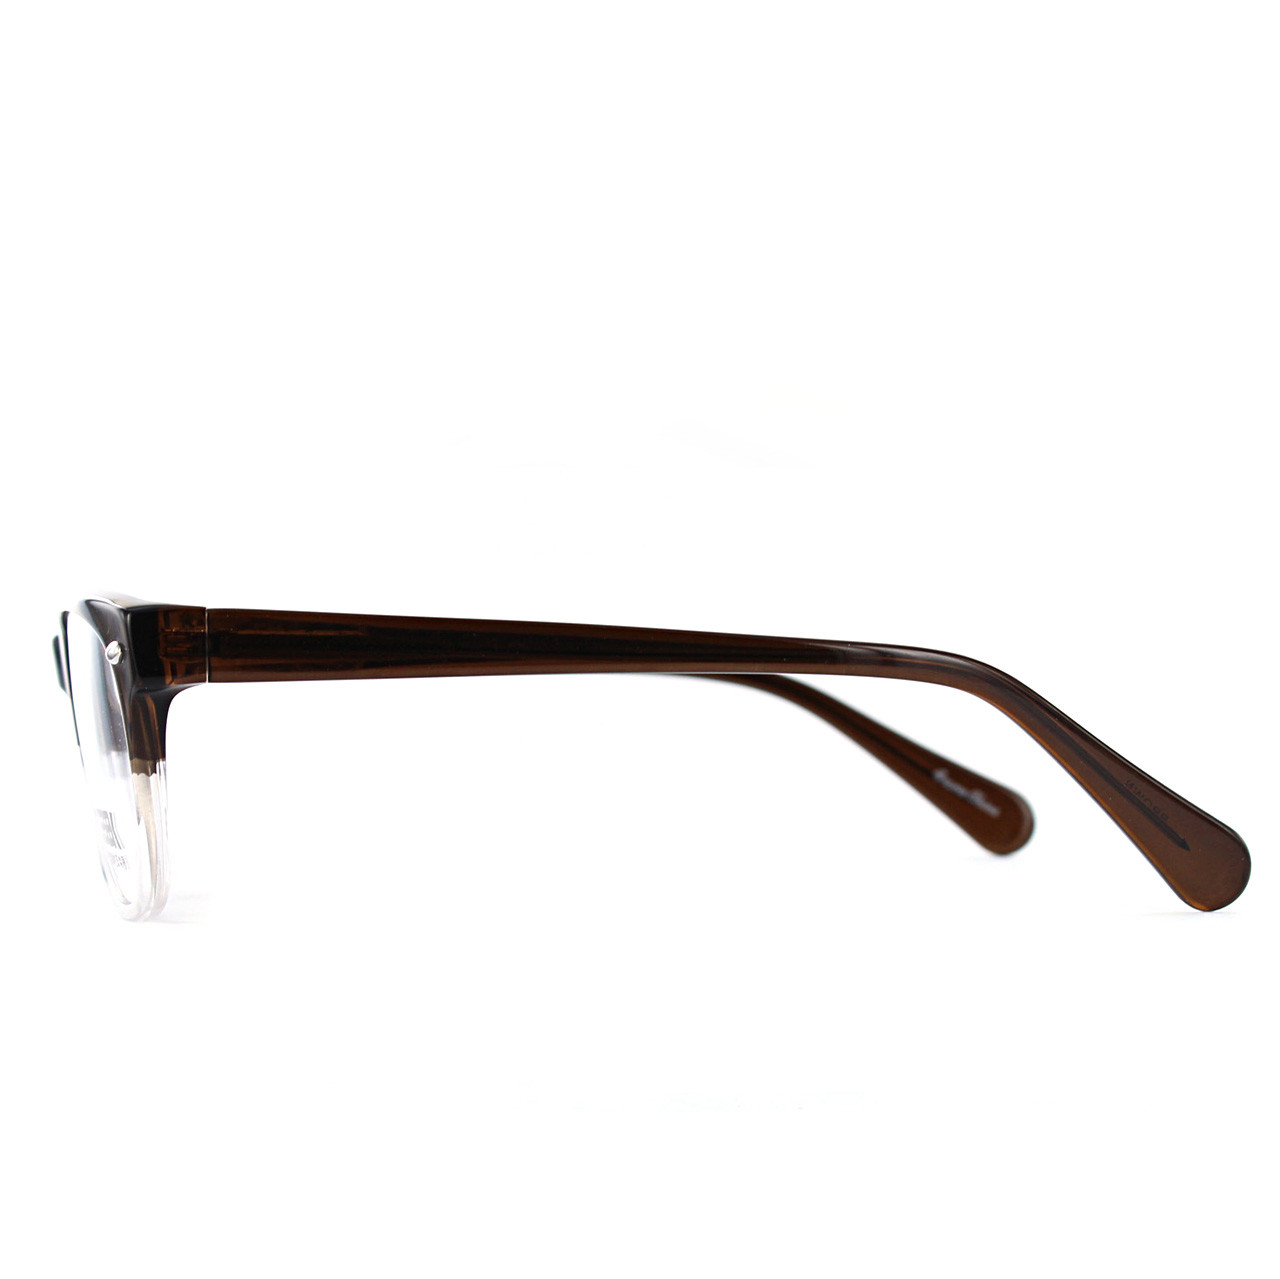 GEEK Eyewear Geek Gamer